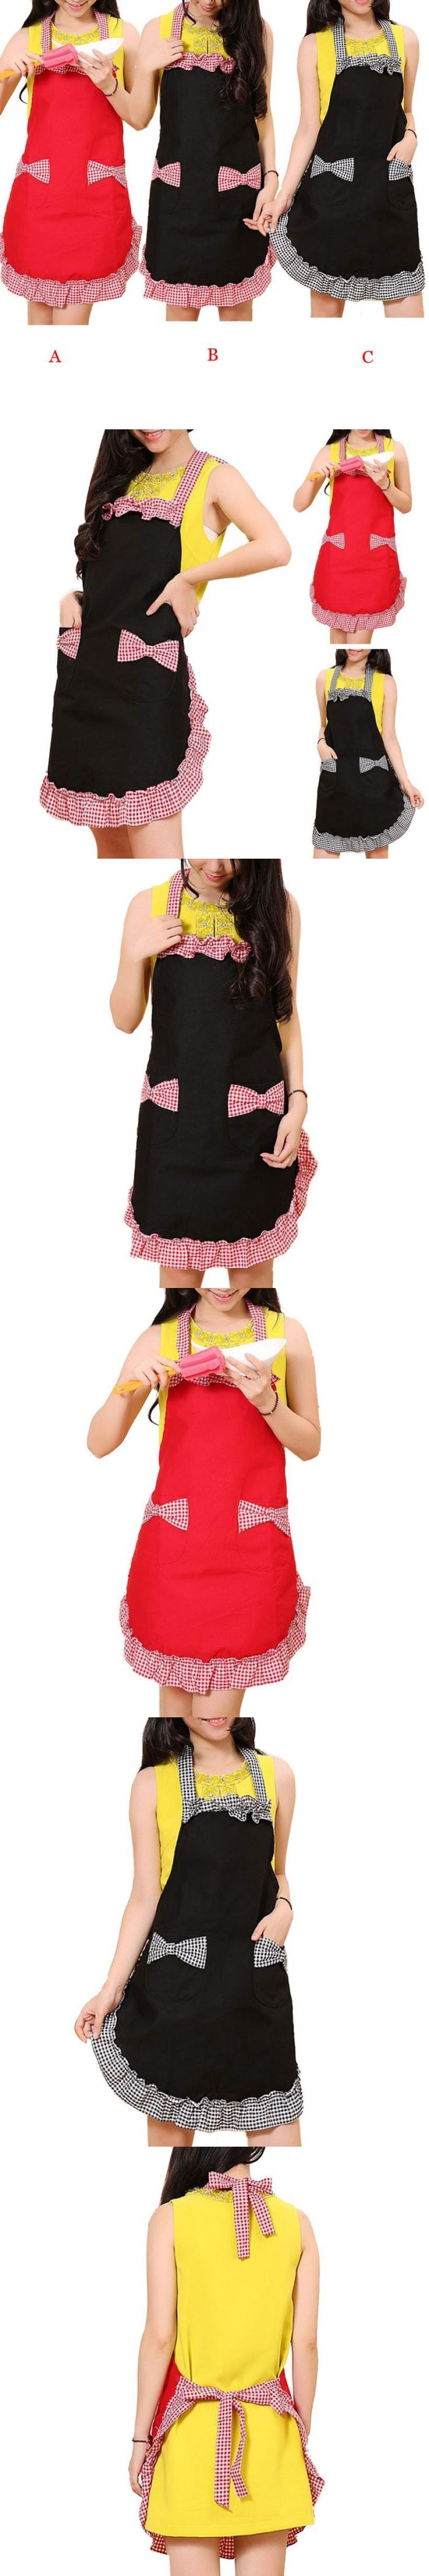 fashion kitchen apron 3 colors ruffled aprons cute aprons for women avental de cozinha divertido #9358